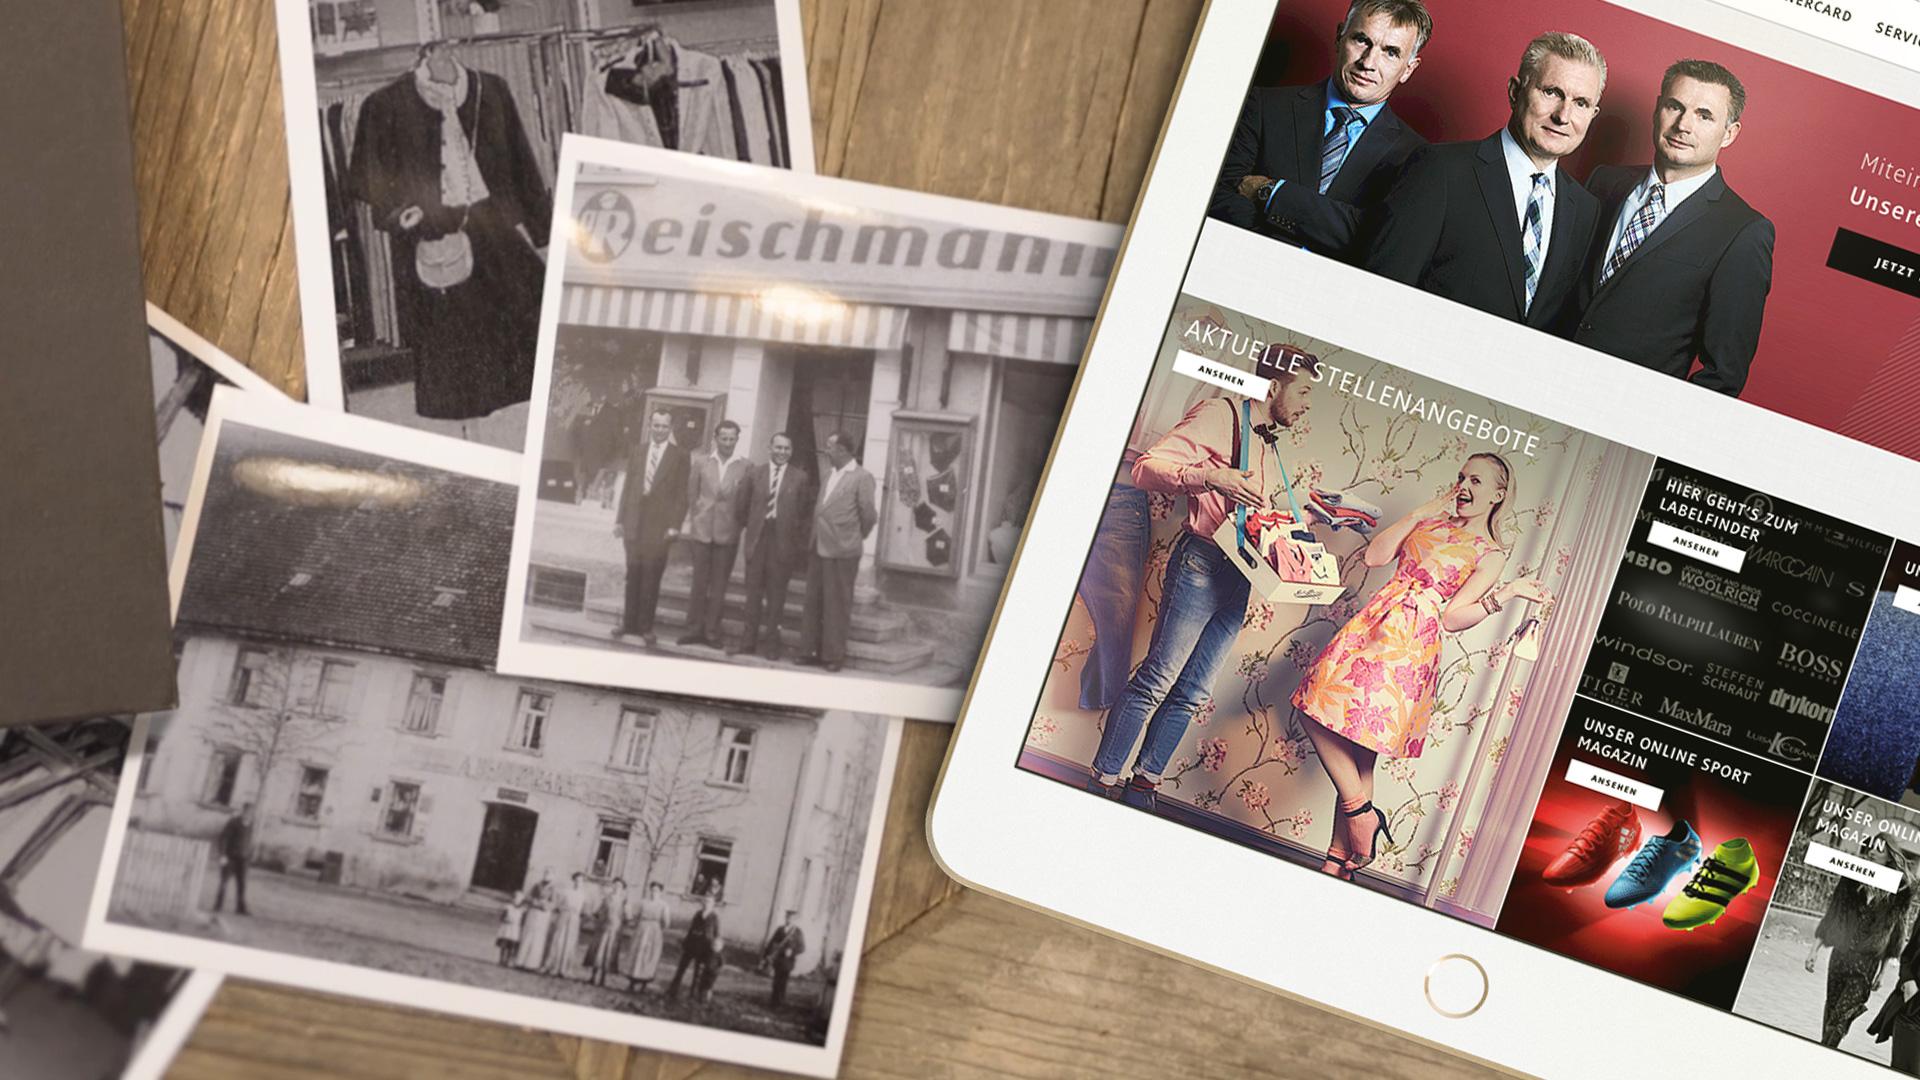 Reischmann-history.jpg